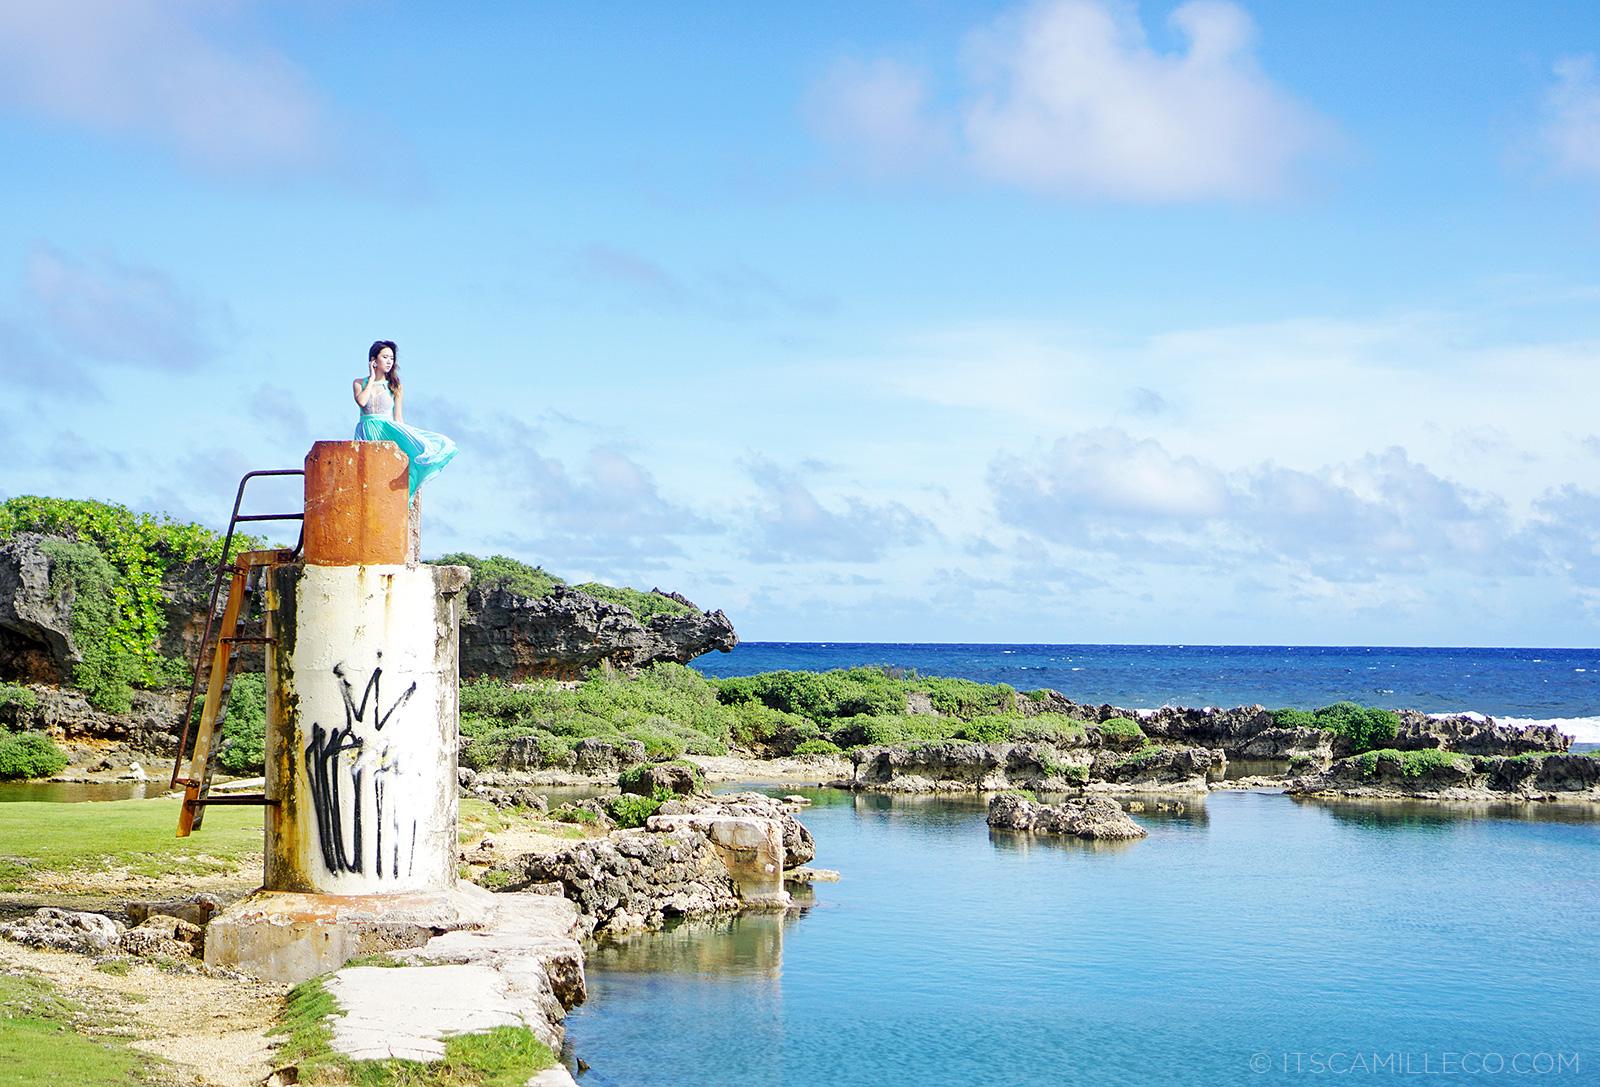 Inarajan Pools, Guam Tourist Spots | www.itscamilleco.com